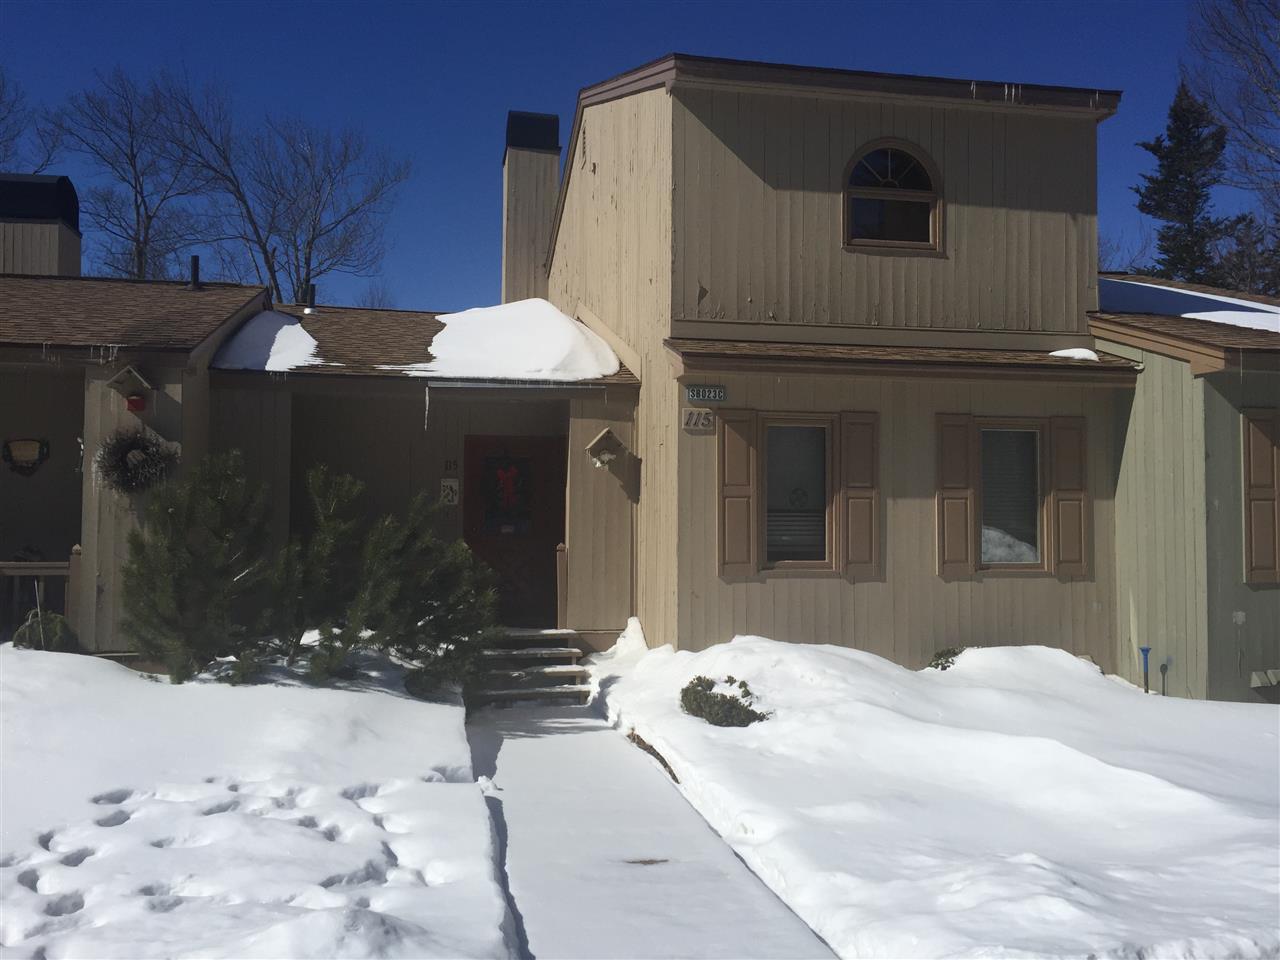 Mount-Snow-Real-Estate-4624619-1